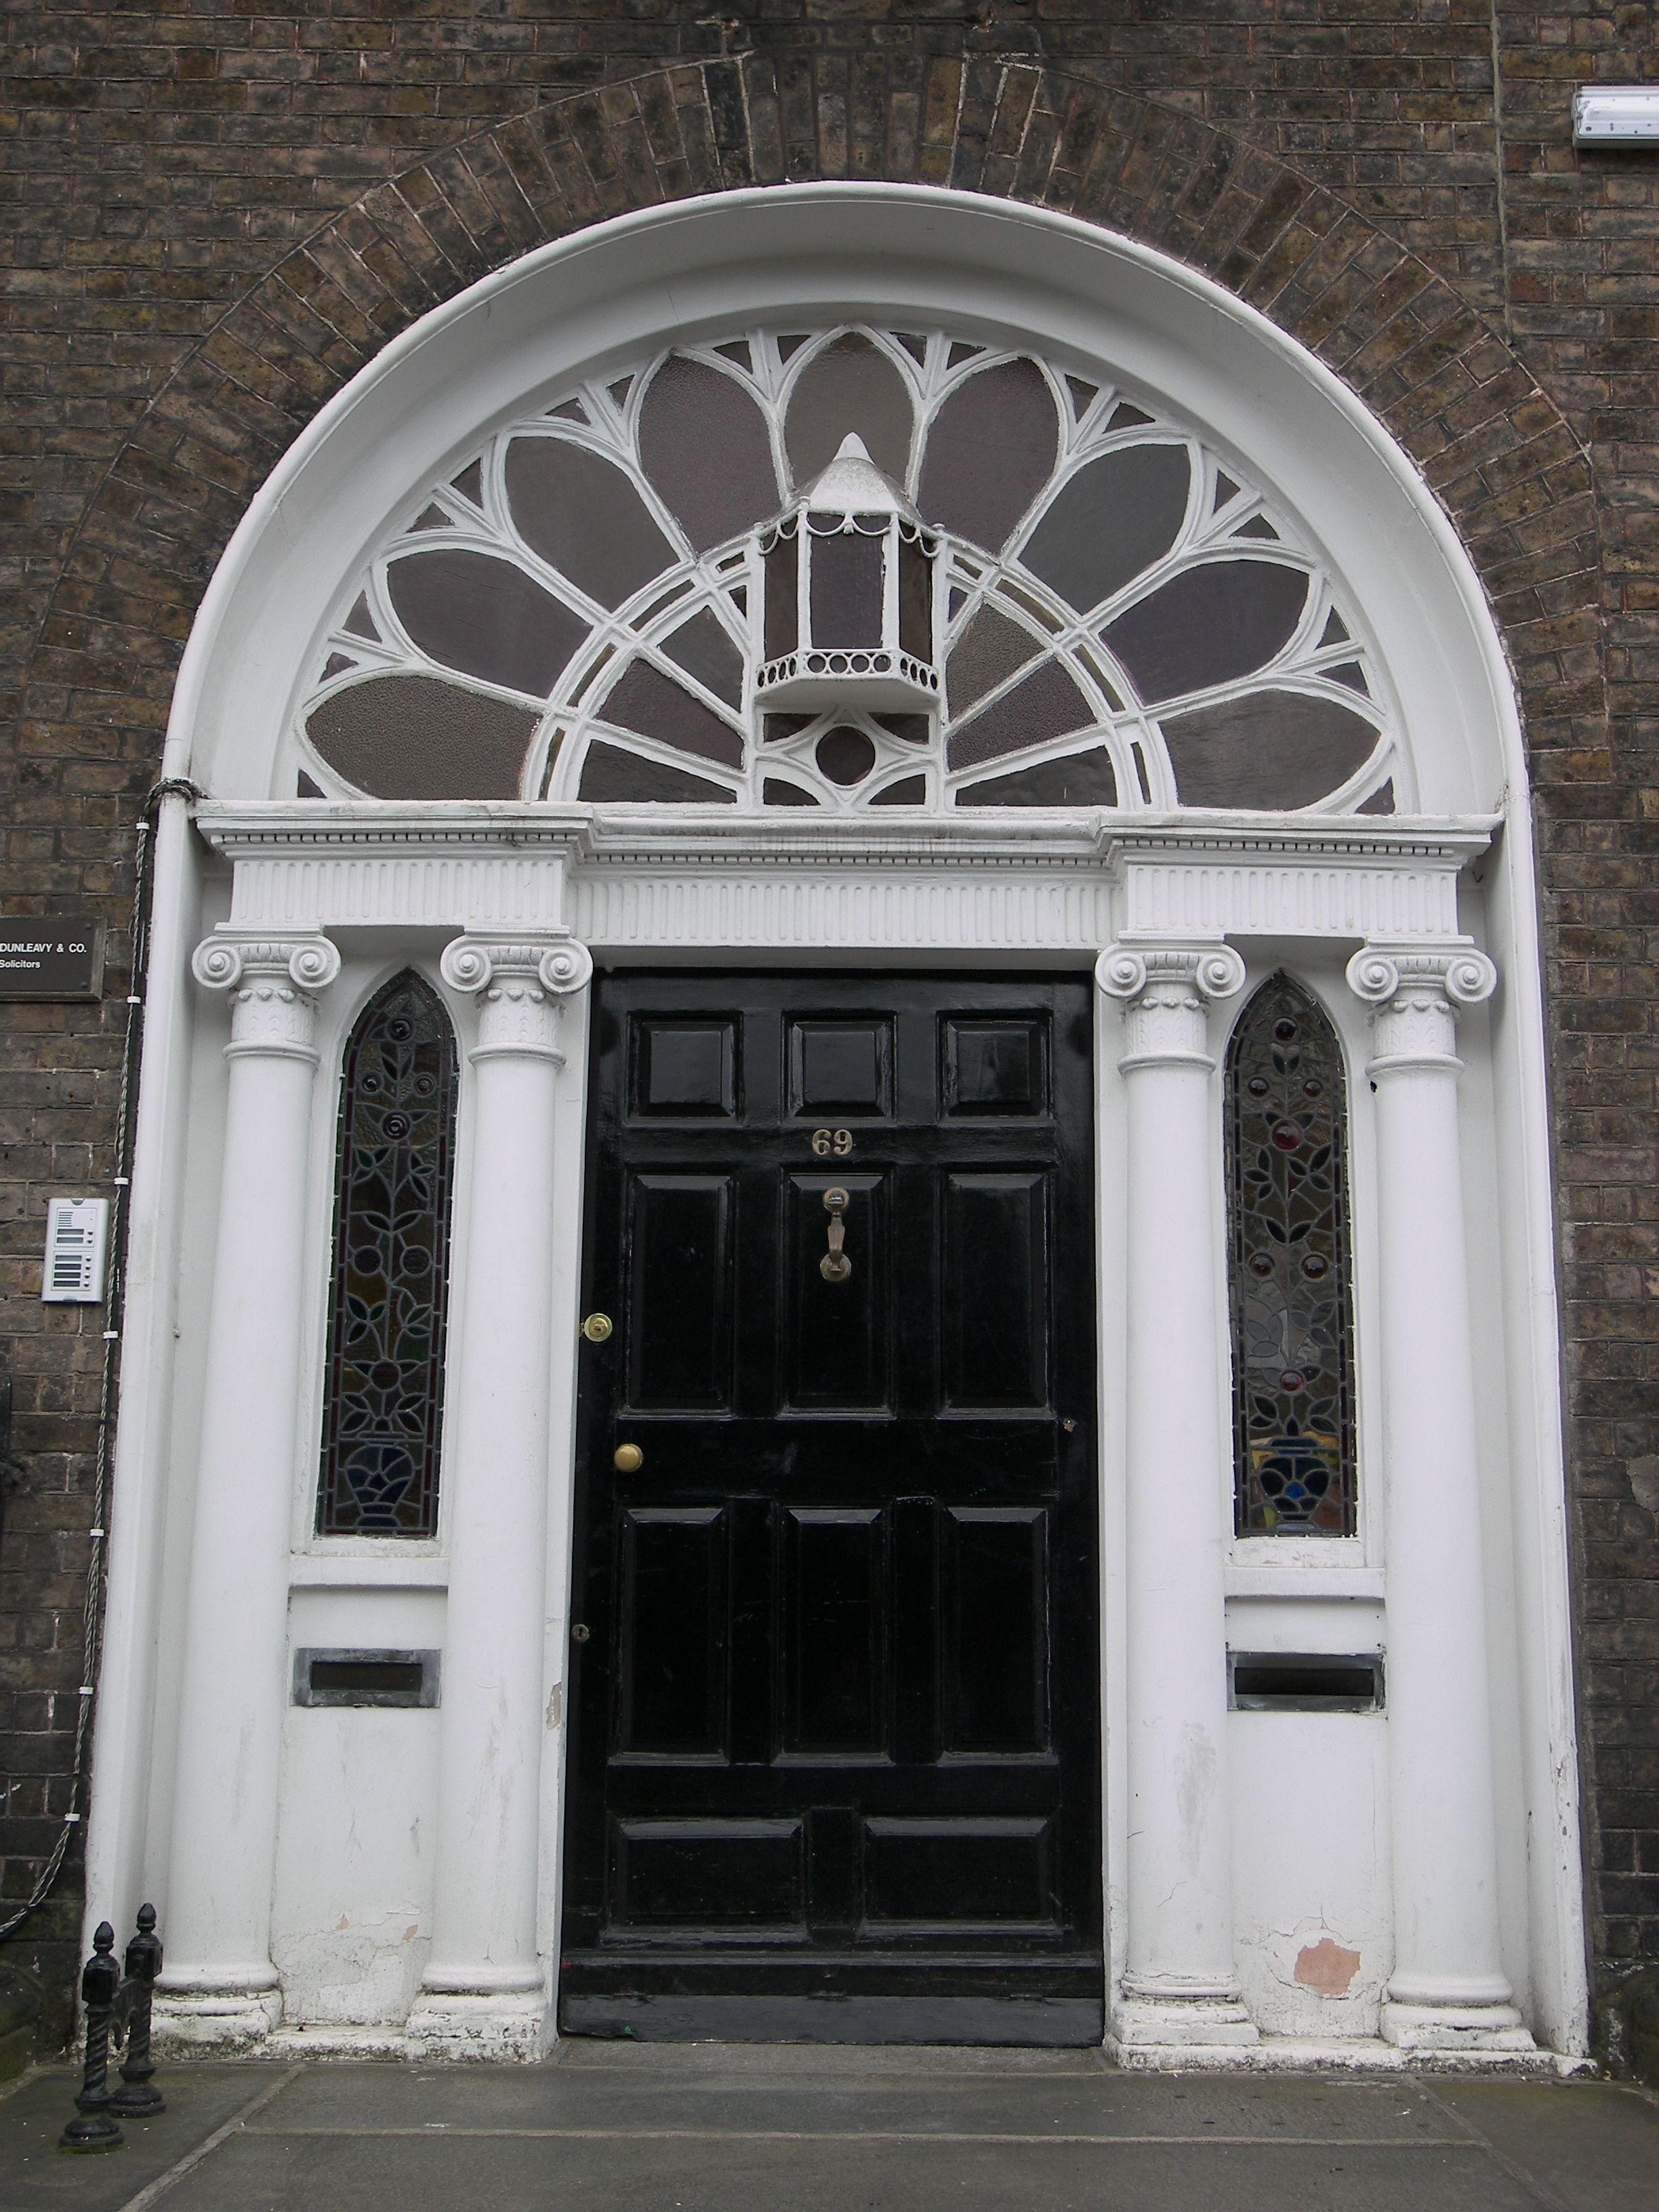 St. Patricks Day Door decor | St patrick's day decorations ...  |Ireland Door Decorations